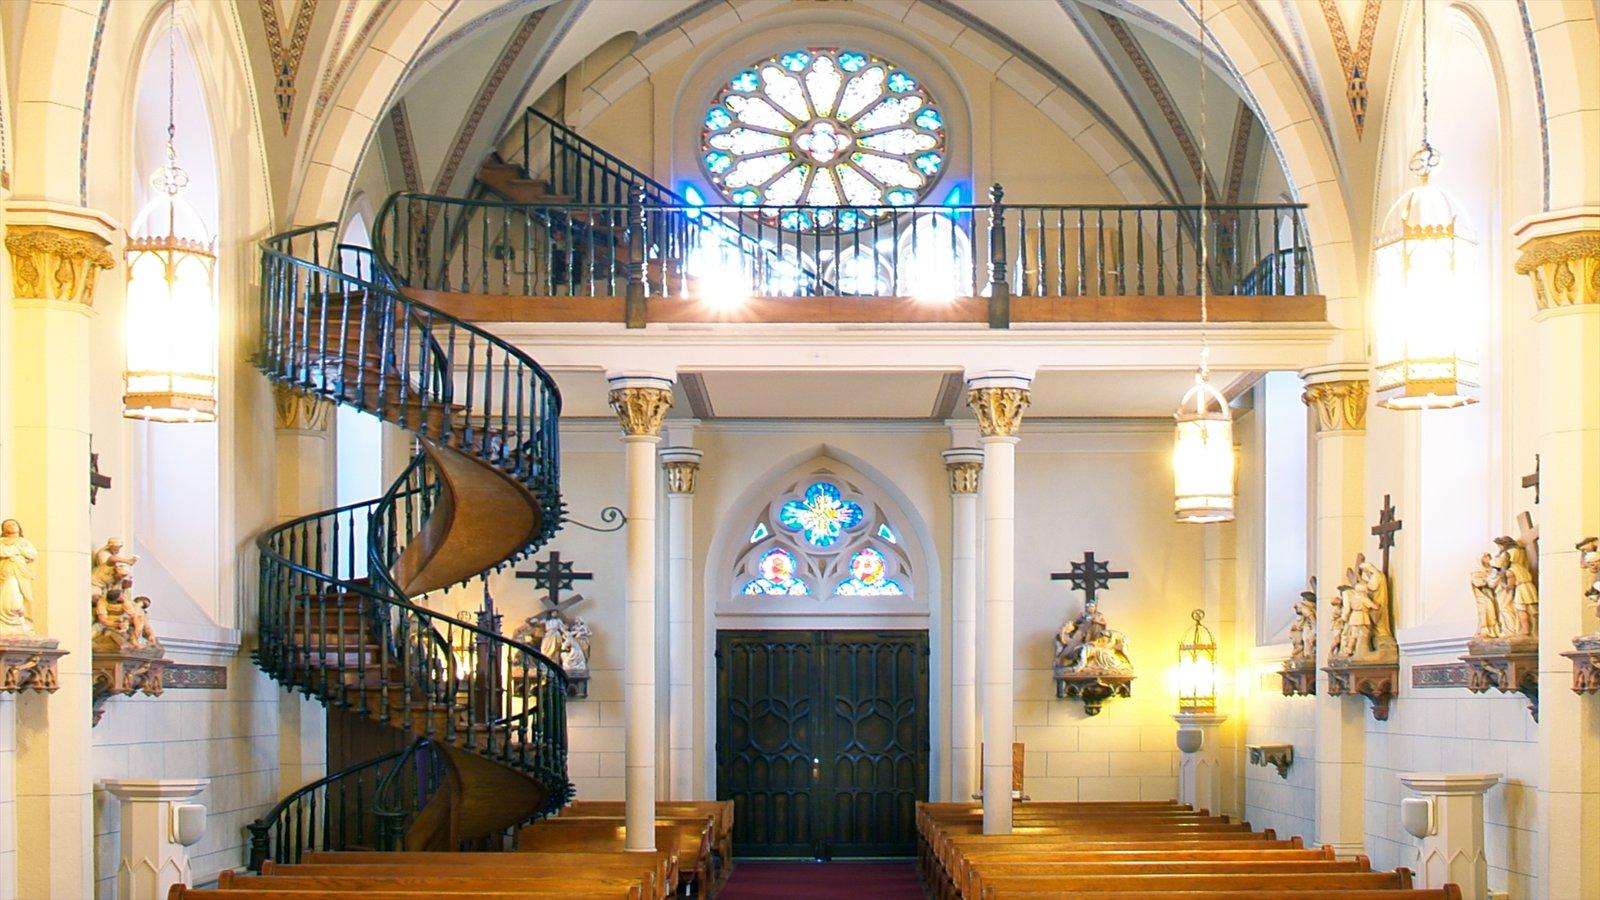 Loretto Chapel mostrando una iglesia o catedral, patrimonio de arquitectura y vistas interiores